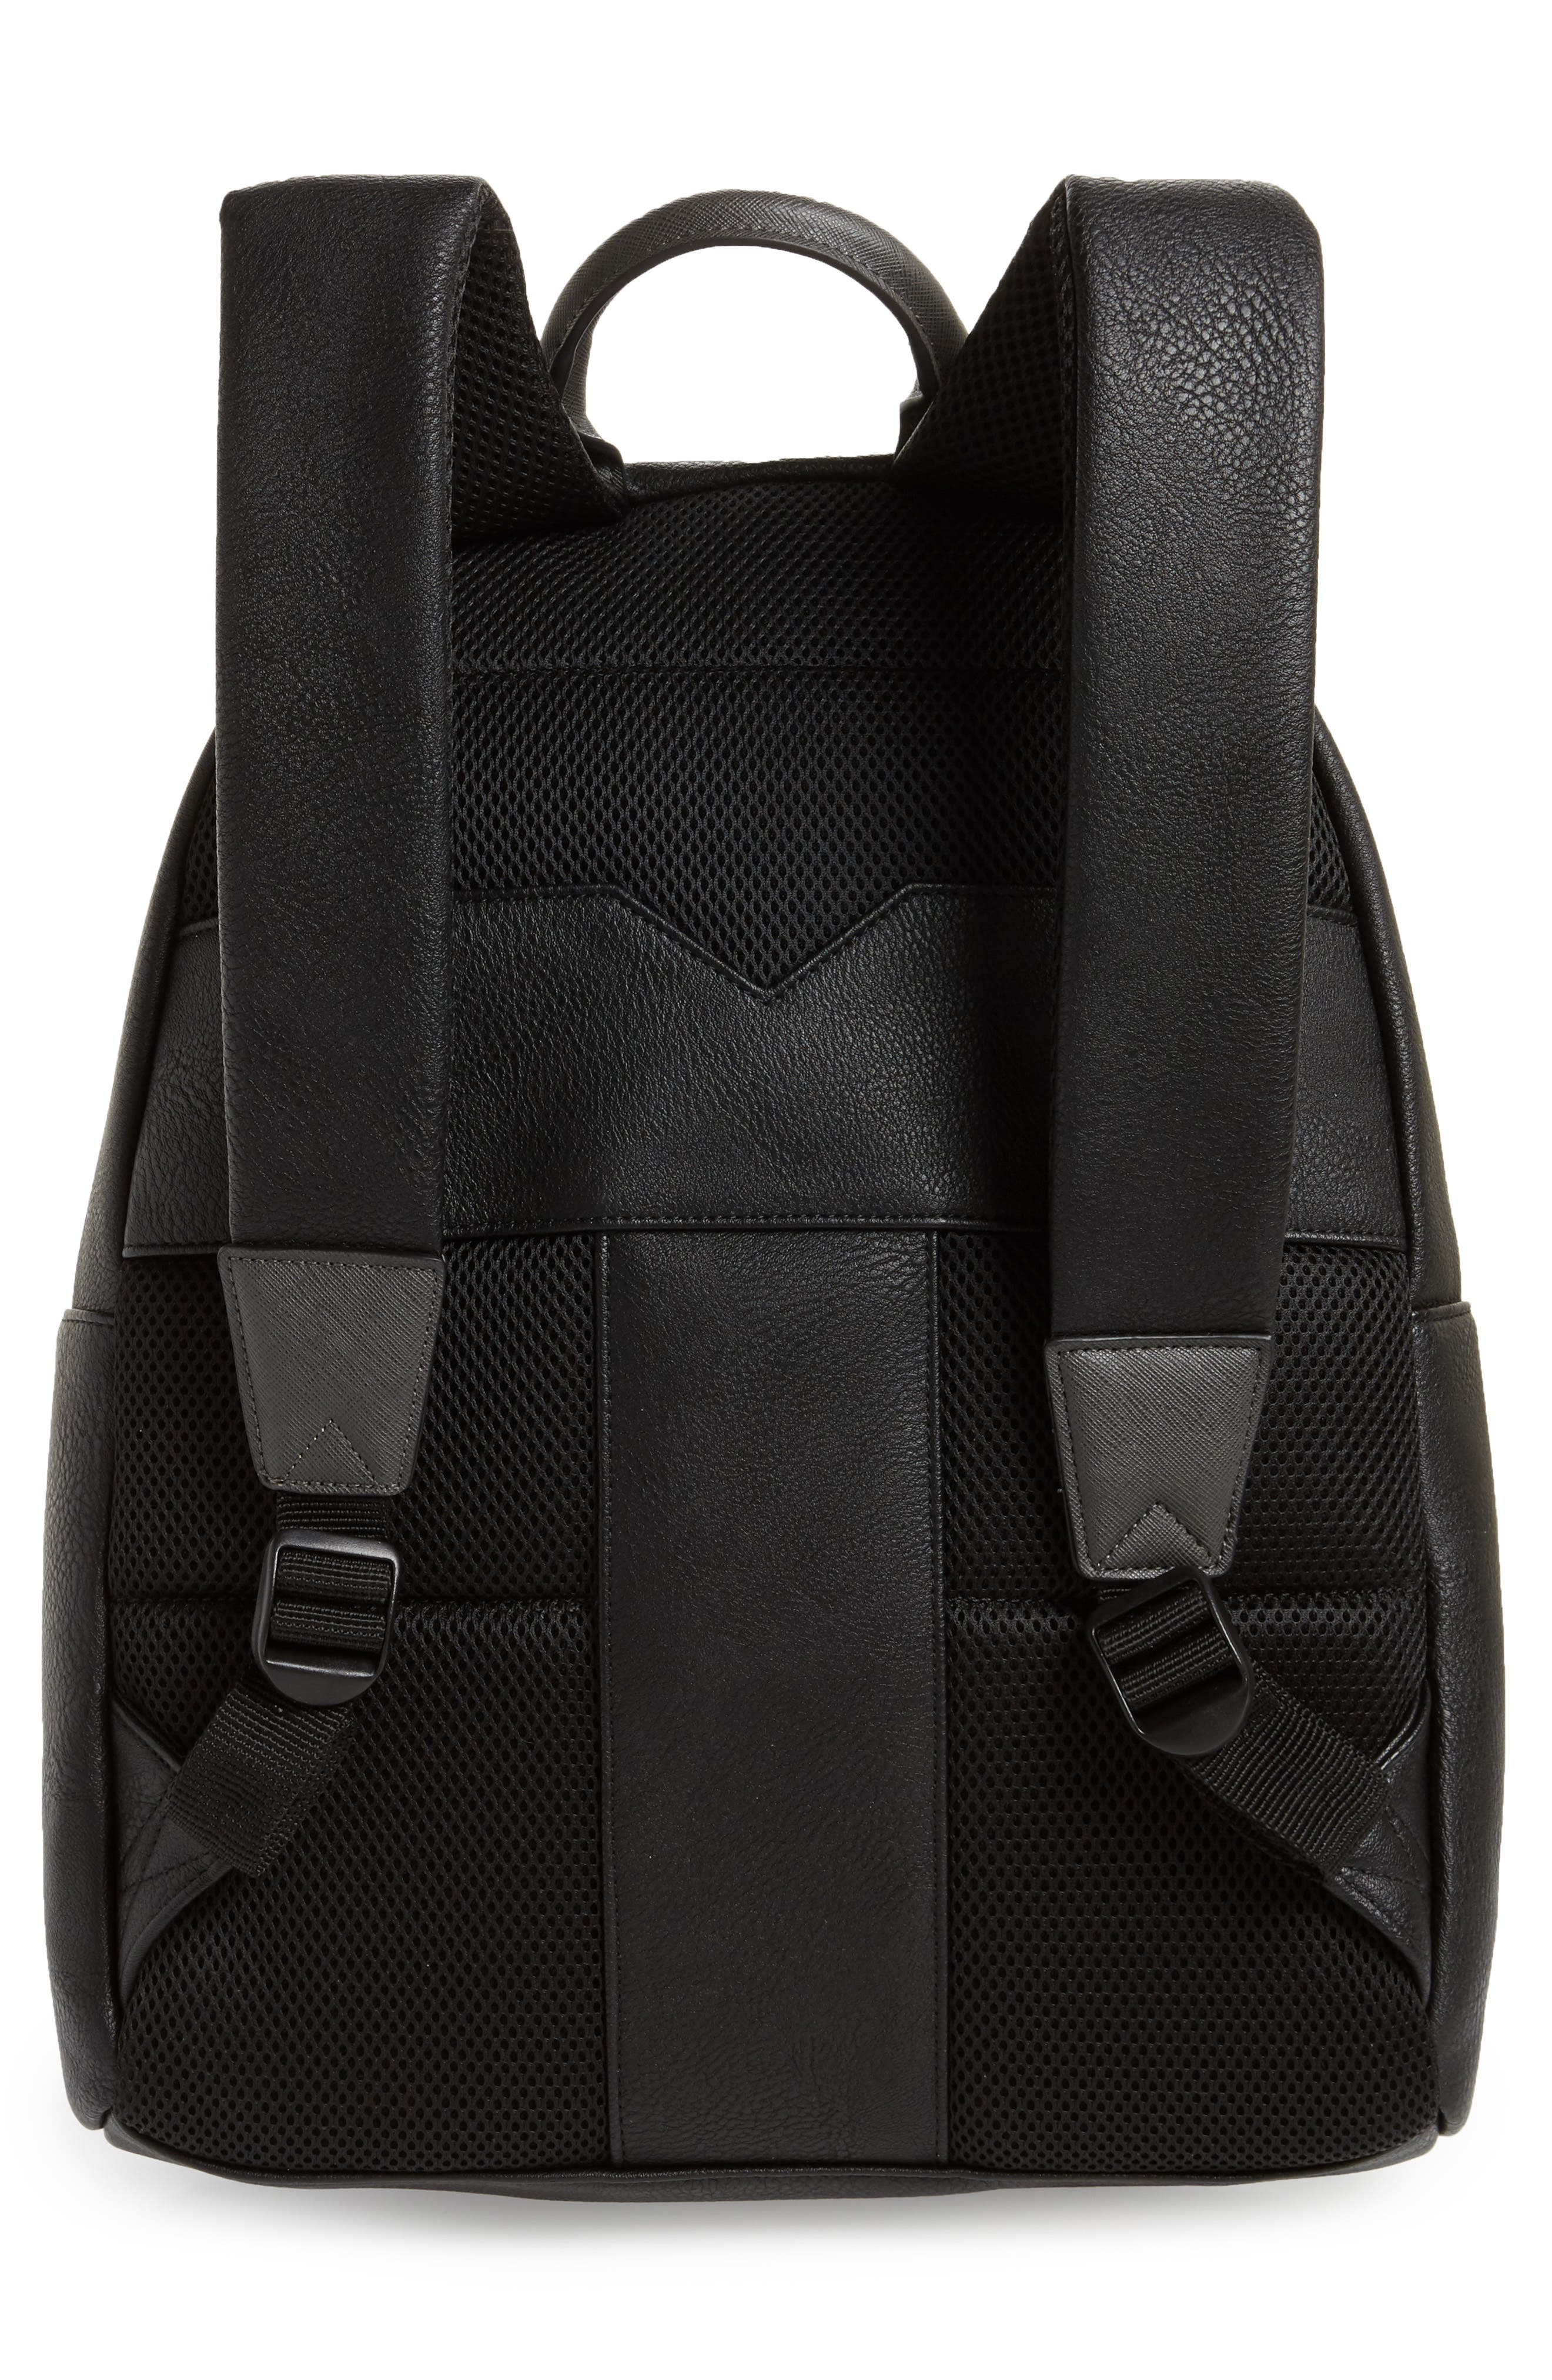 Royale Backpack,                             Alternate thumbnail 3, color,